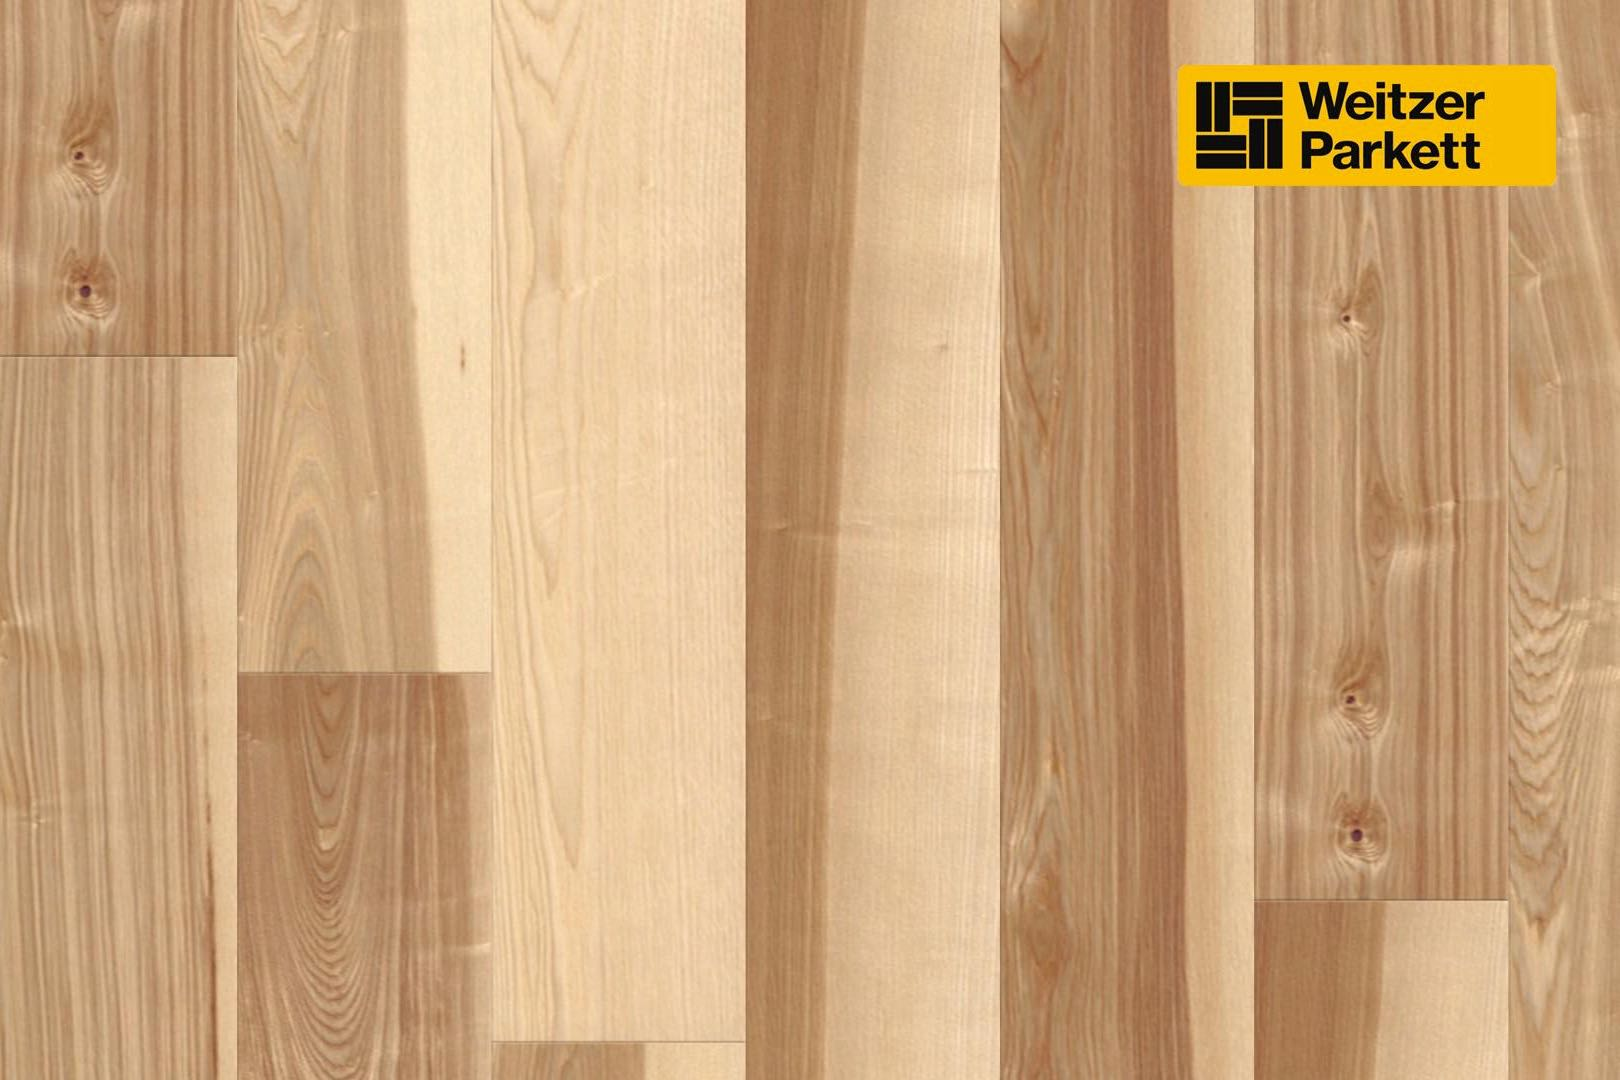 weitzer parkett charisma einblatt kernesche lebhaft bunt gefast geb rstet matt lackiert. Black Bedroom Furniture Sets. Home Design Ideas